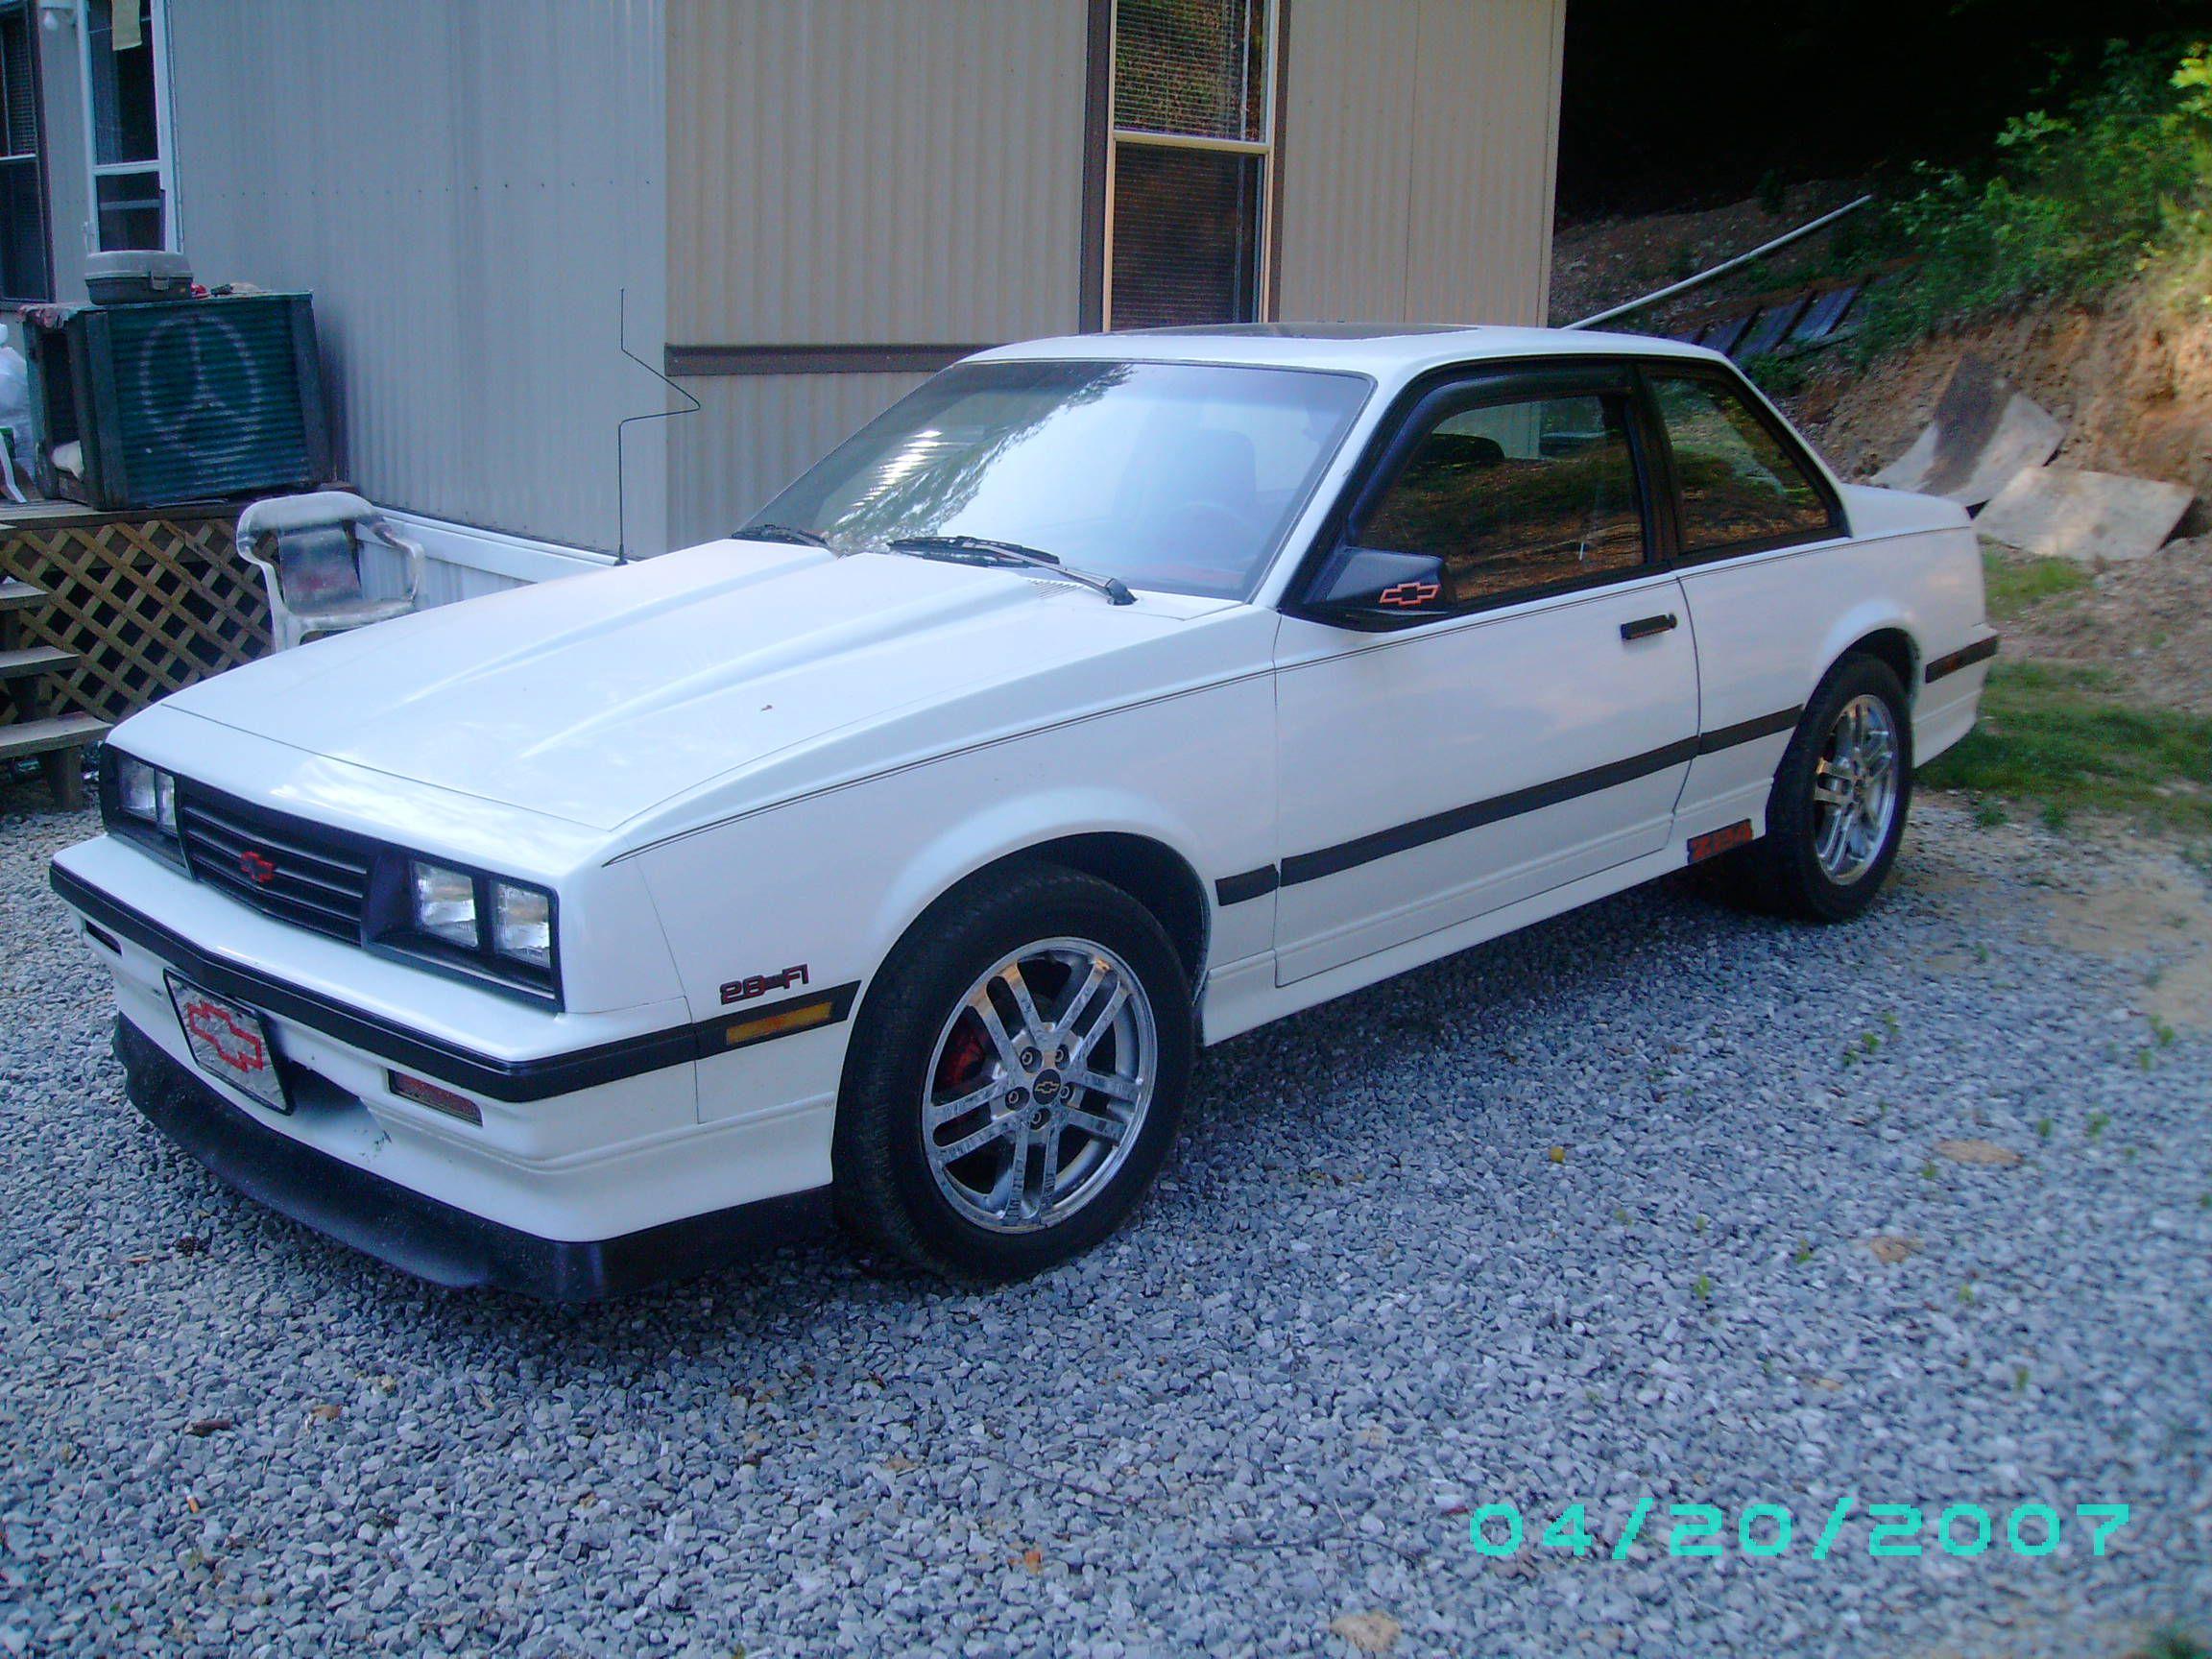 white 1986 chevy cavalier z24 my 2nd car  [ 2304 x 1728 Pixel ]